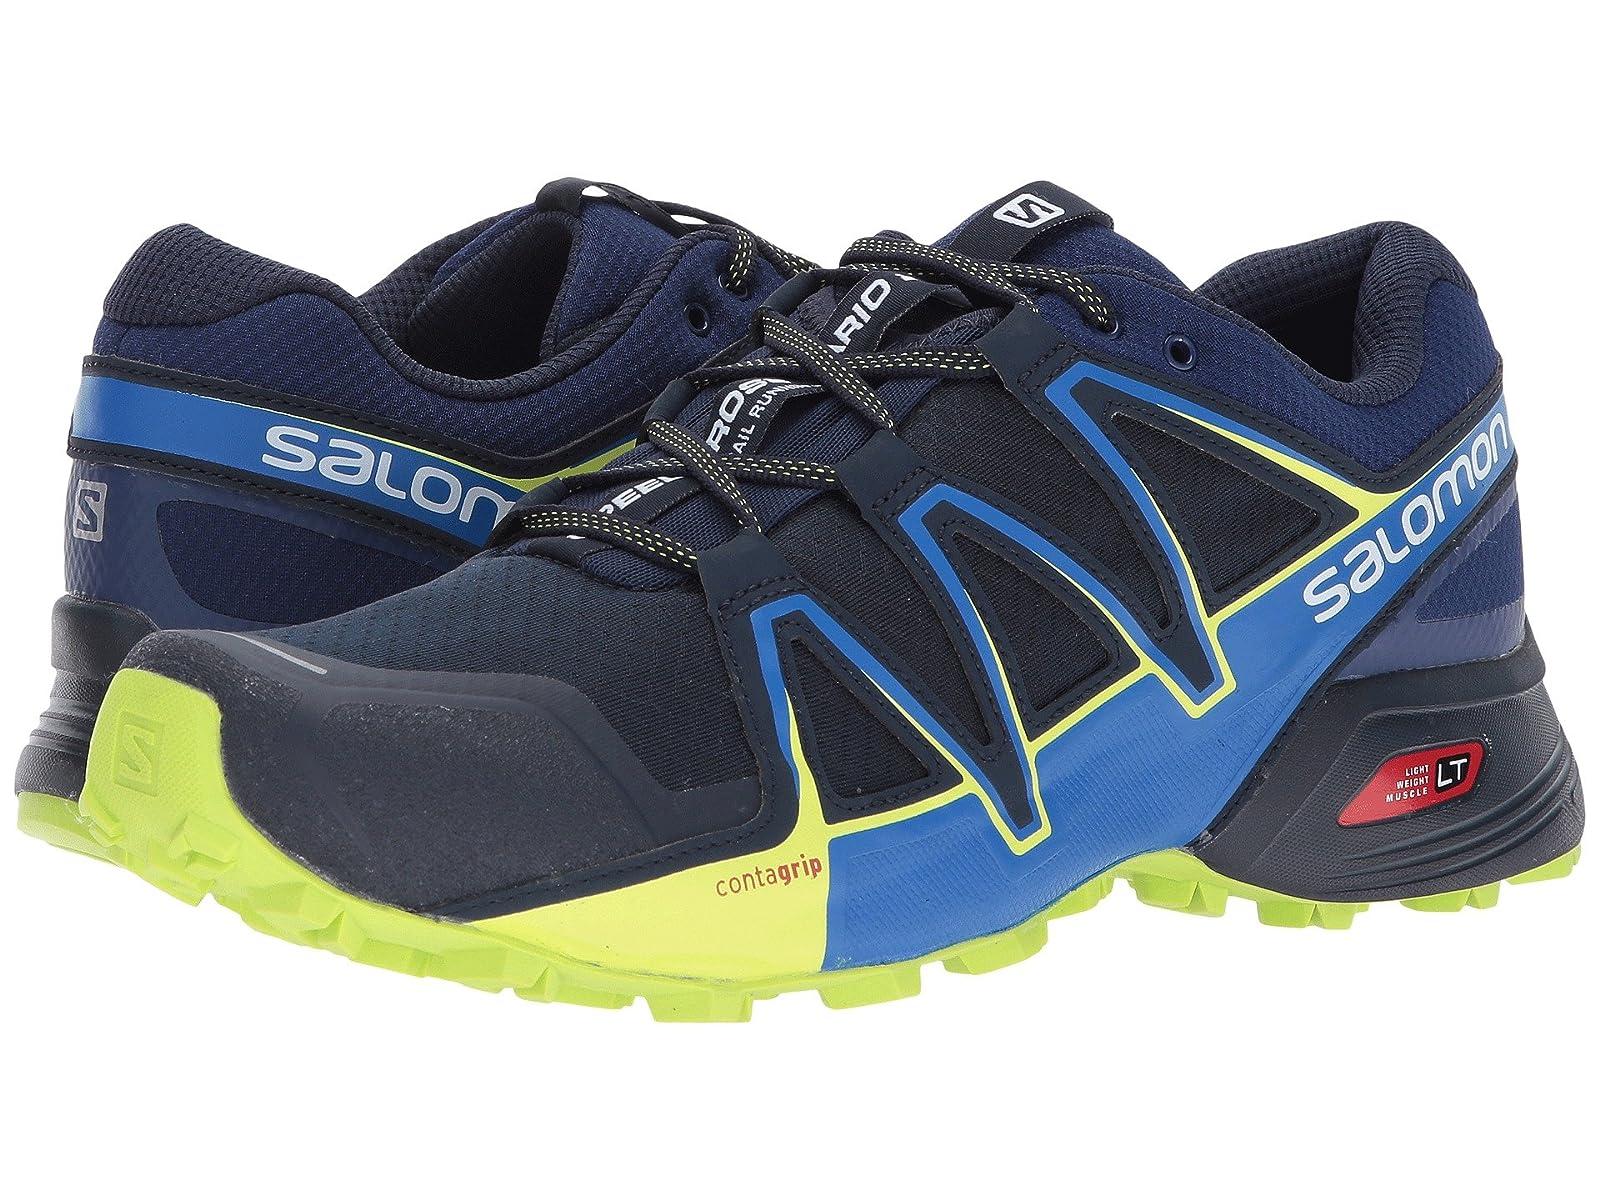 Salomon Speedcross Vario 2Atmospheric grades have affordable shoes